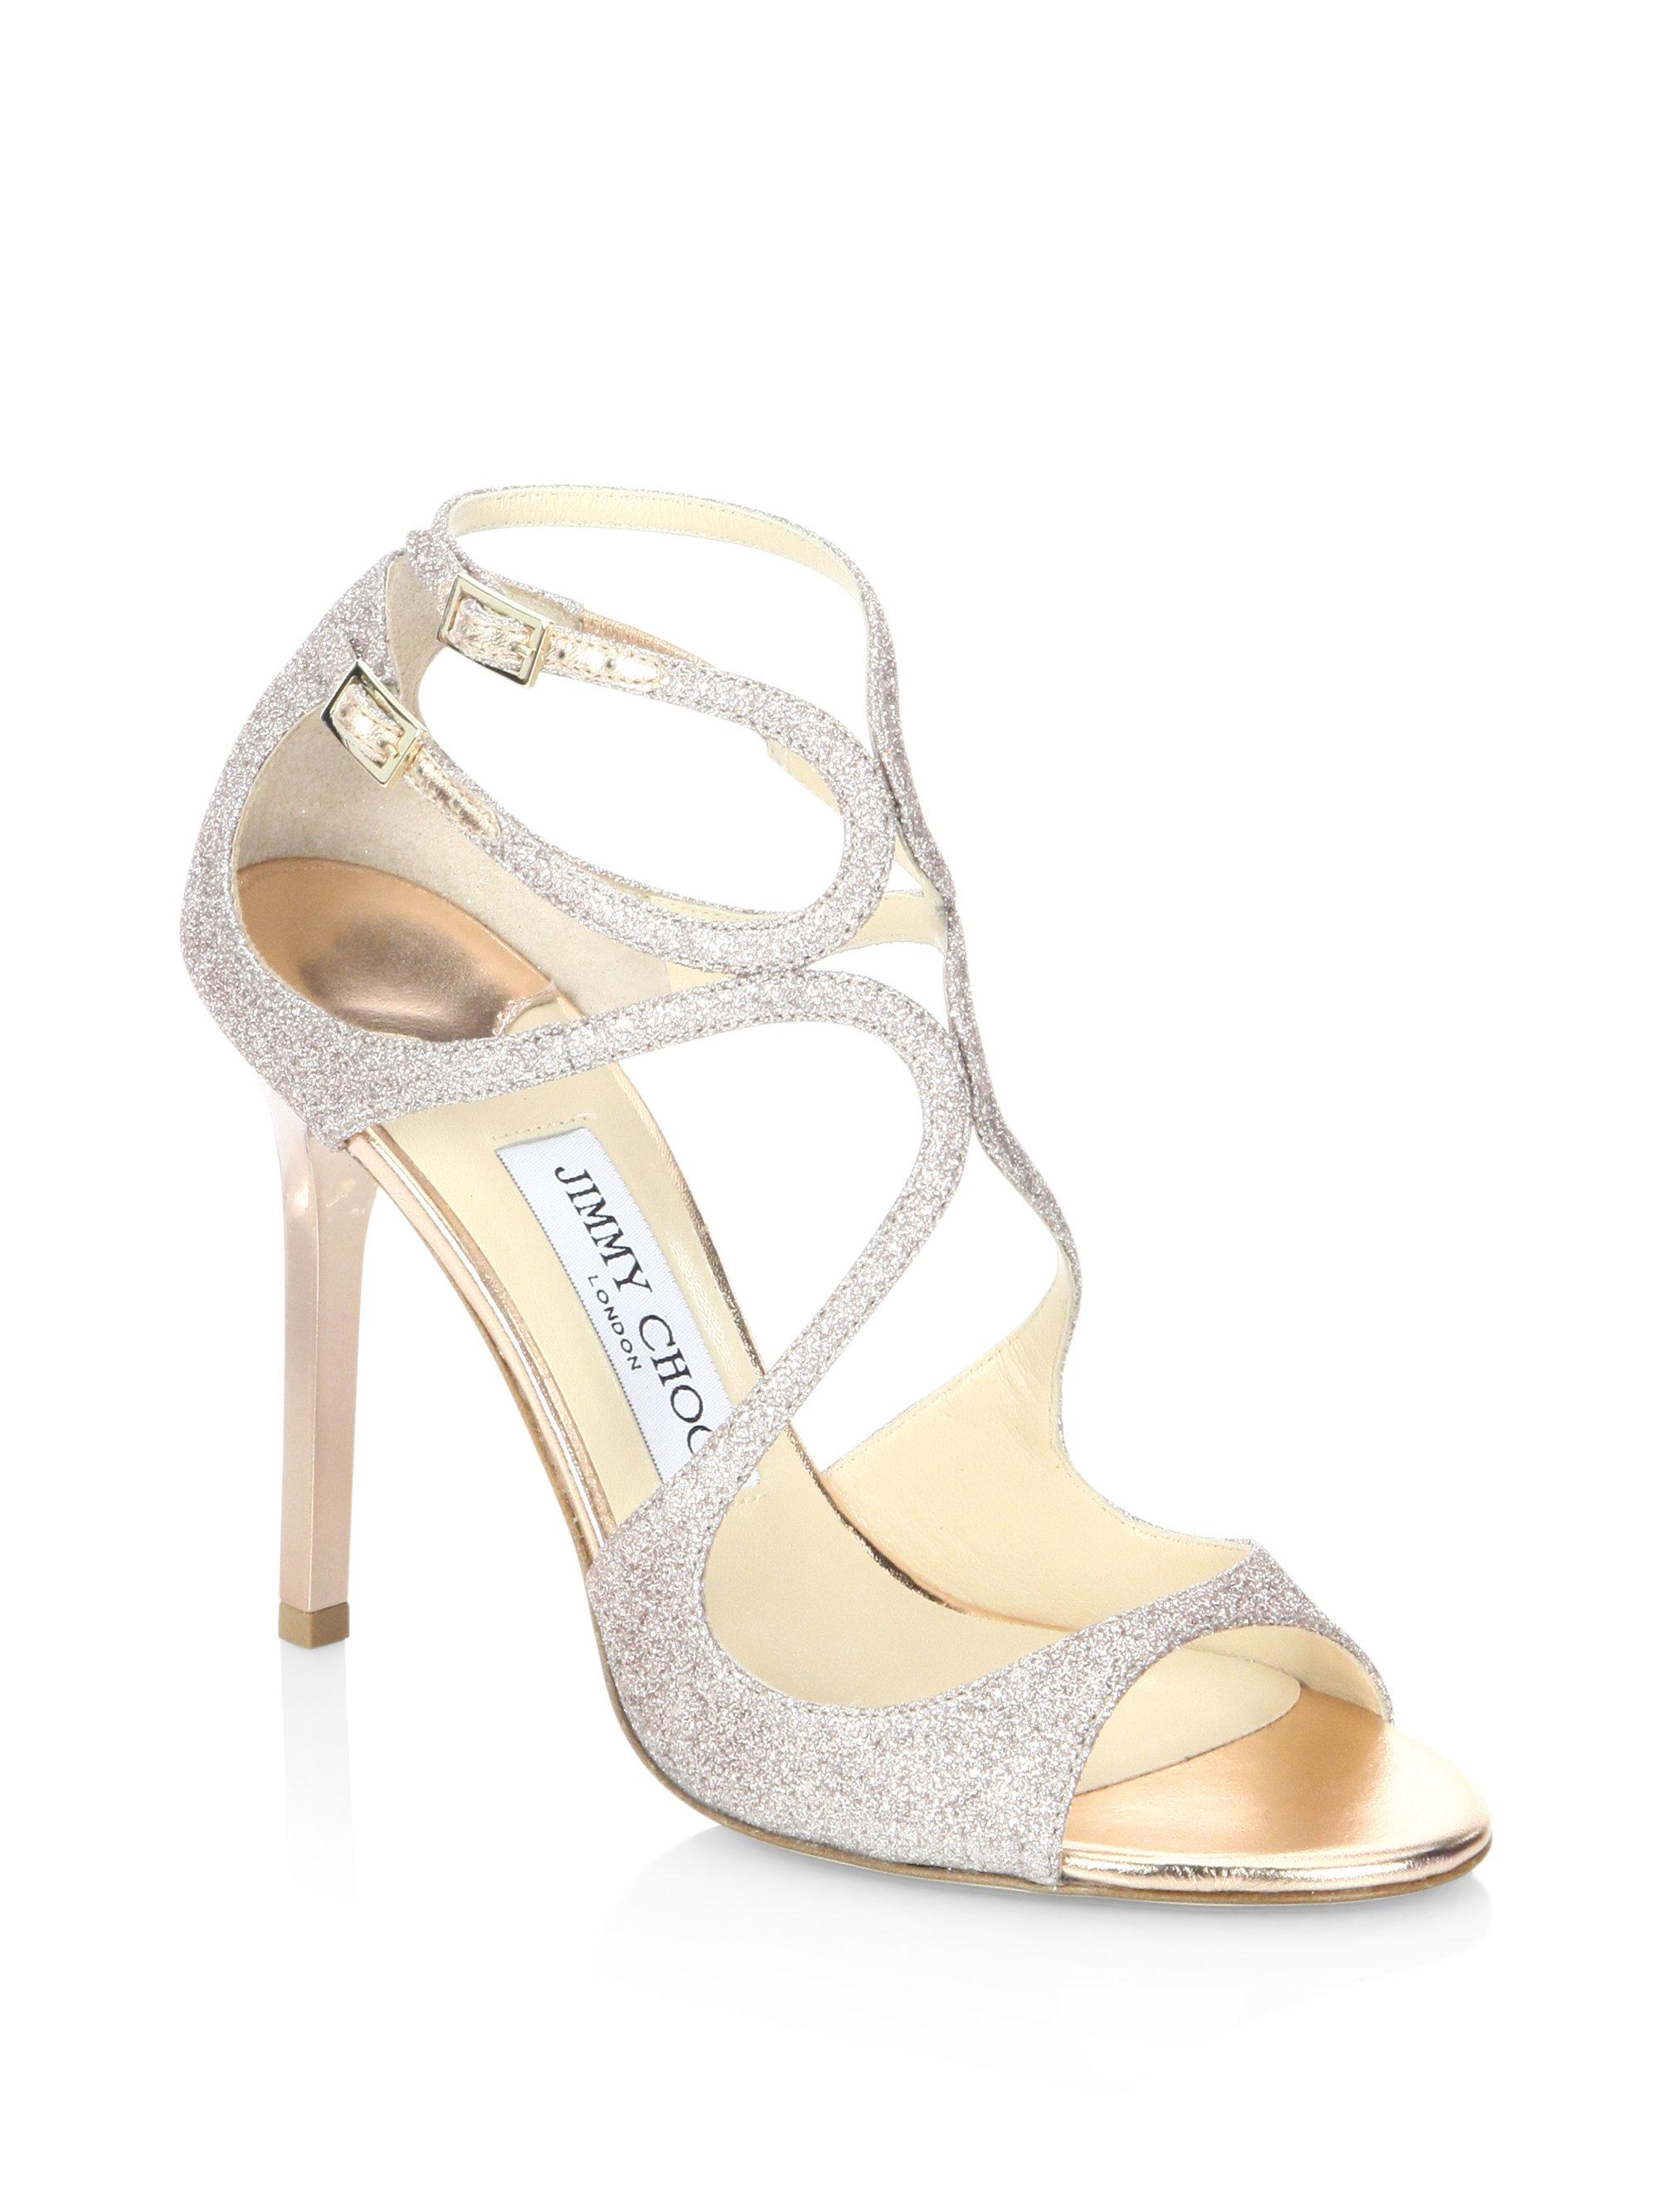 863033465cba4 Jimmy Choo Lang 100 Glitter Sandals in Metallic - Lyst